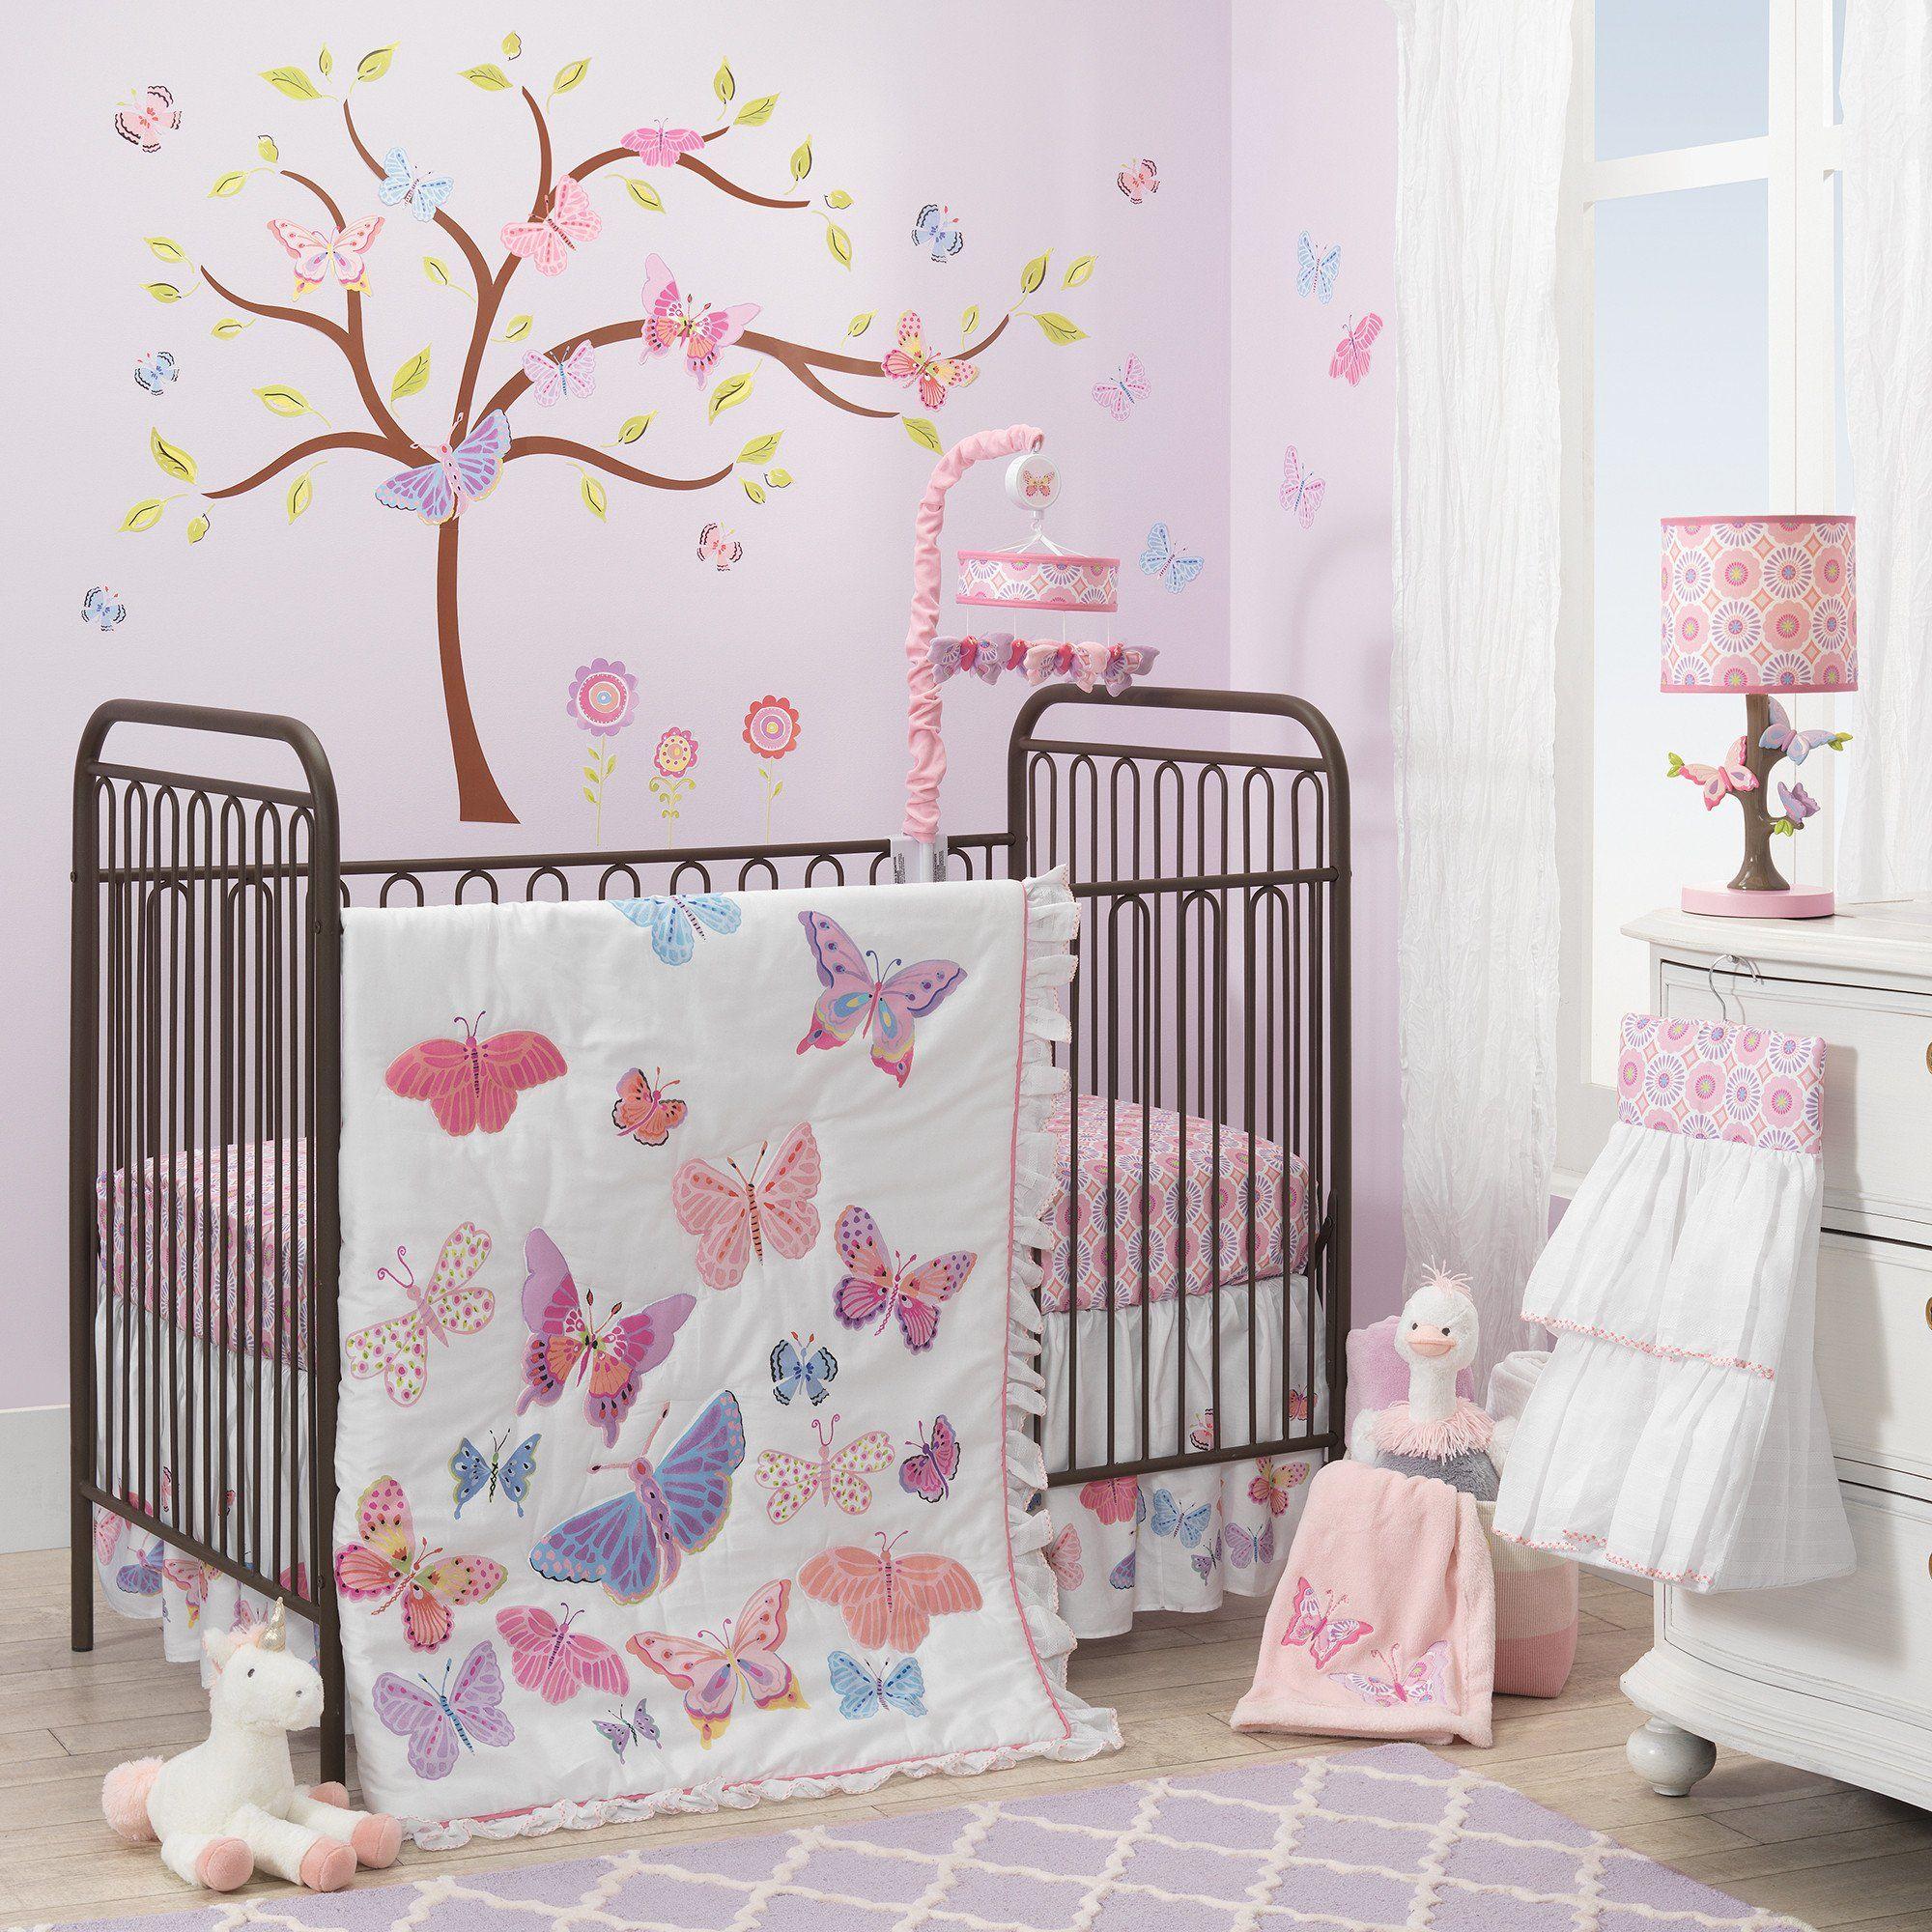 Butterfly Garden White/Pink/Purple Nursery 4-Piece Baby ...